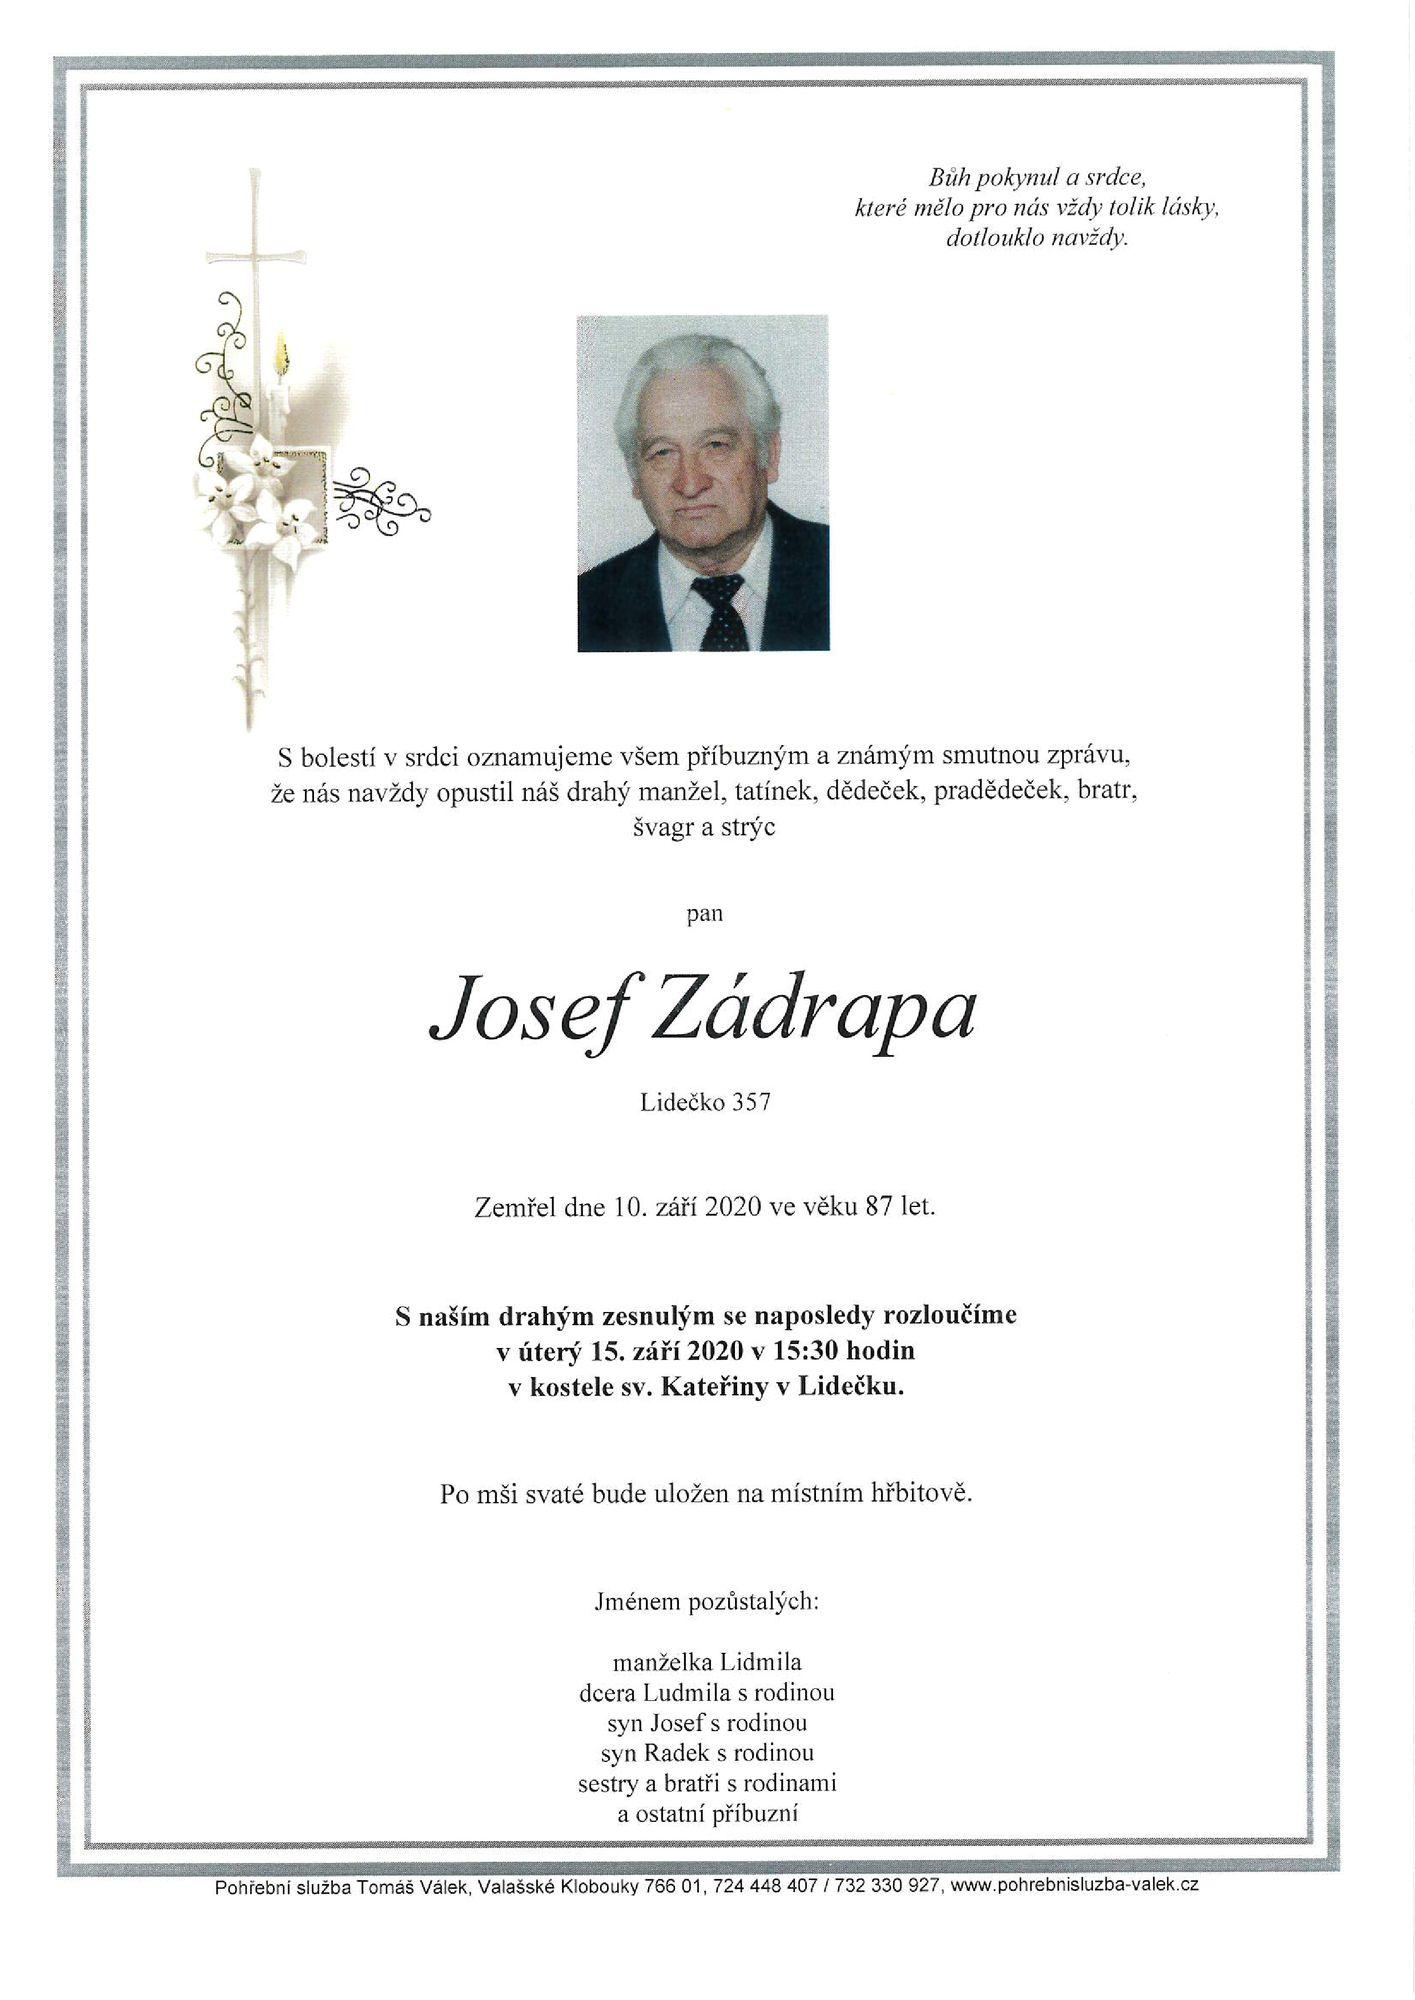 Josef Zádrapa